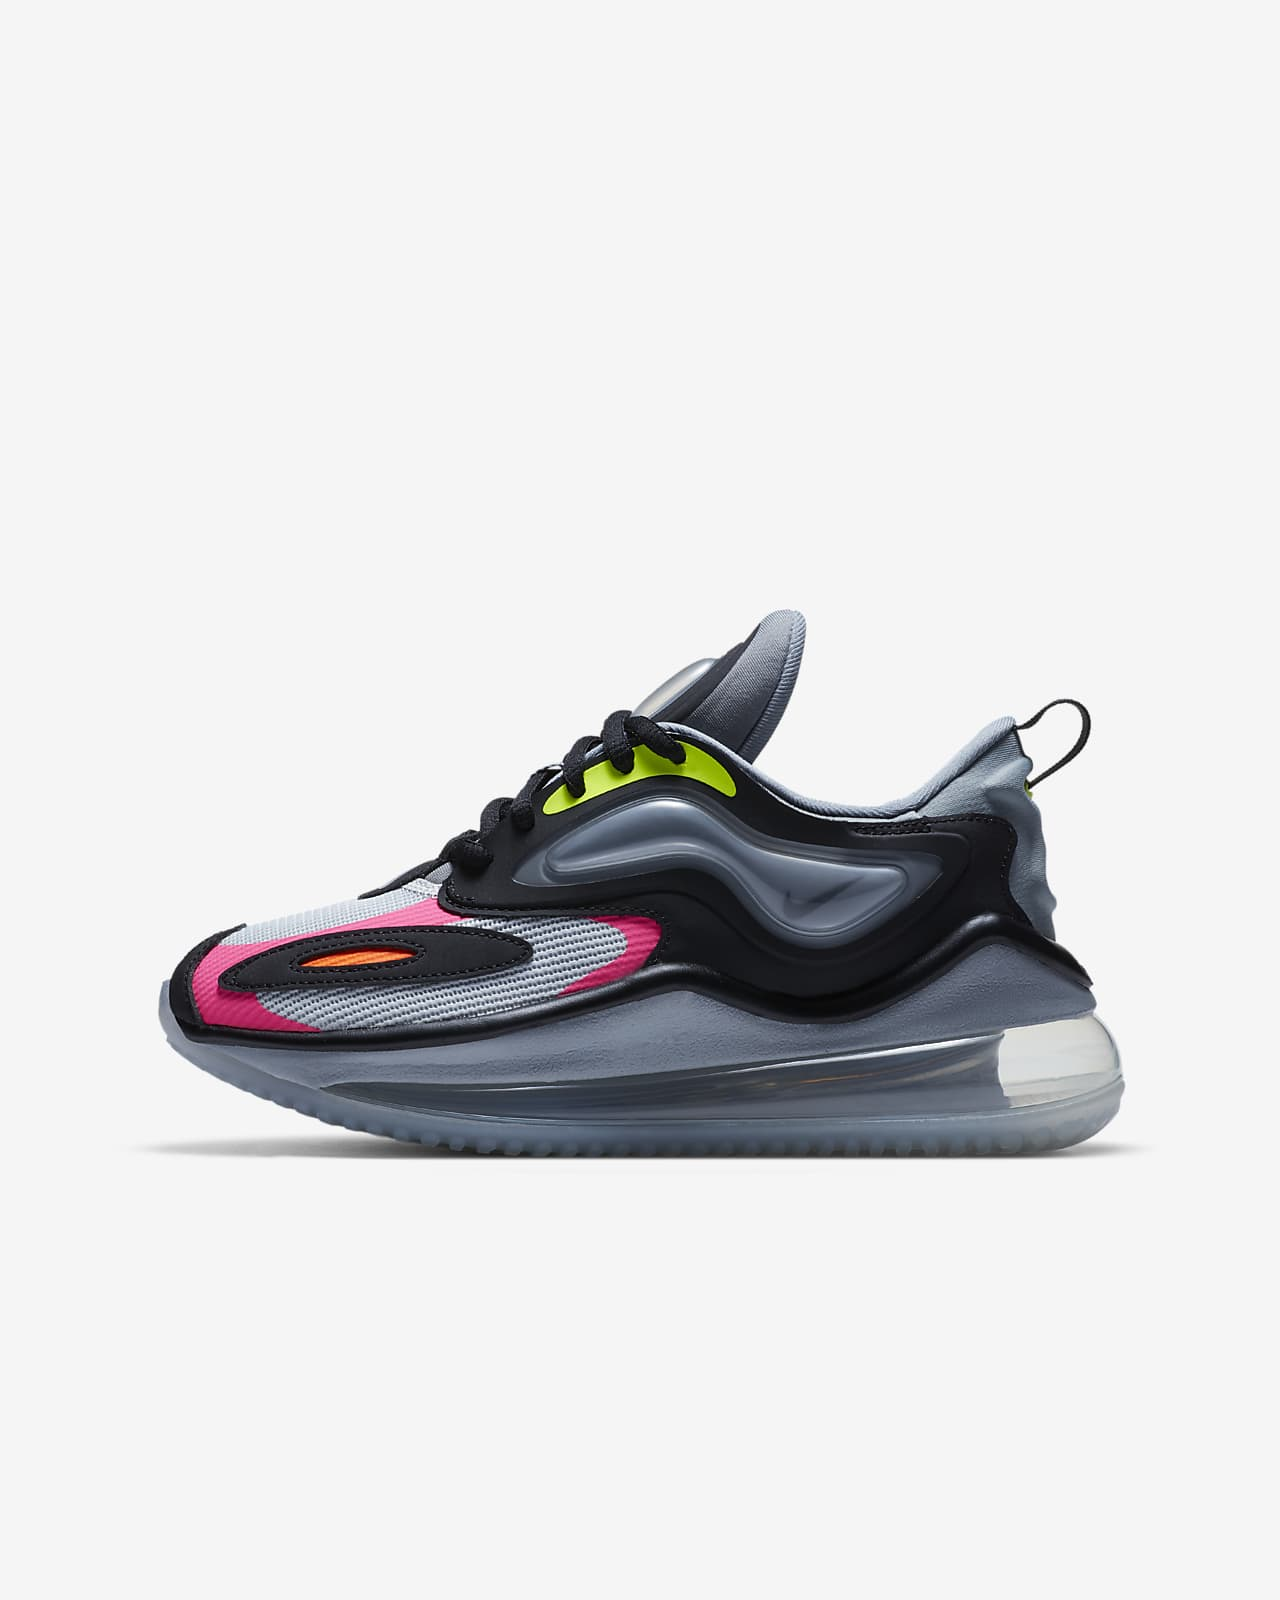 Nike Air Max Zephyr Big Kids' Shoe